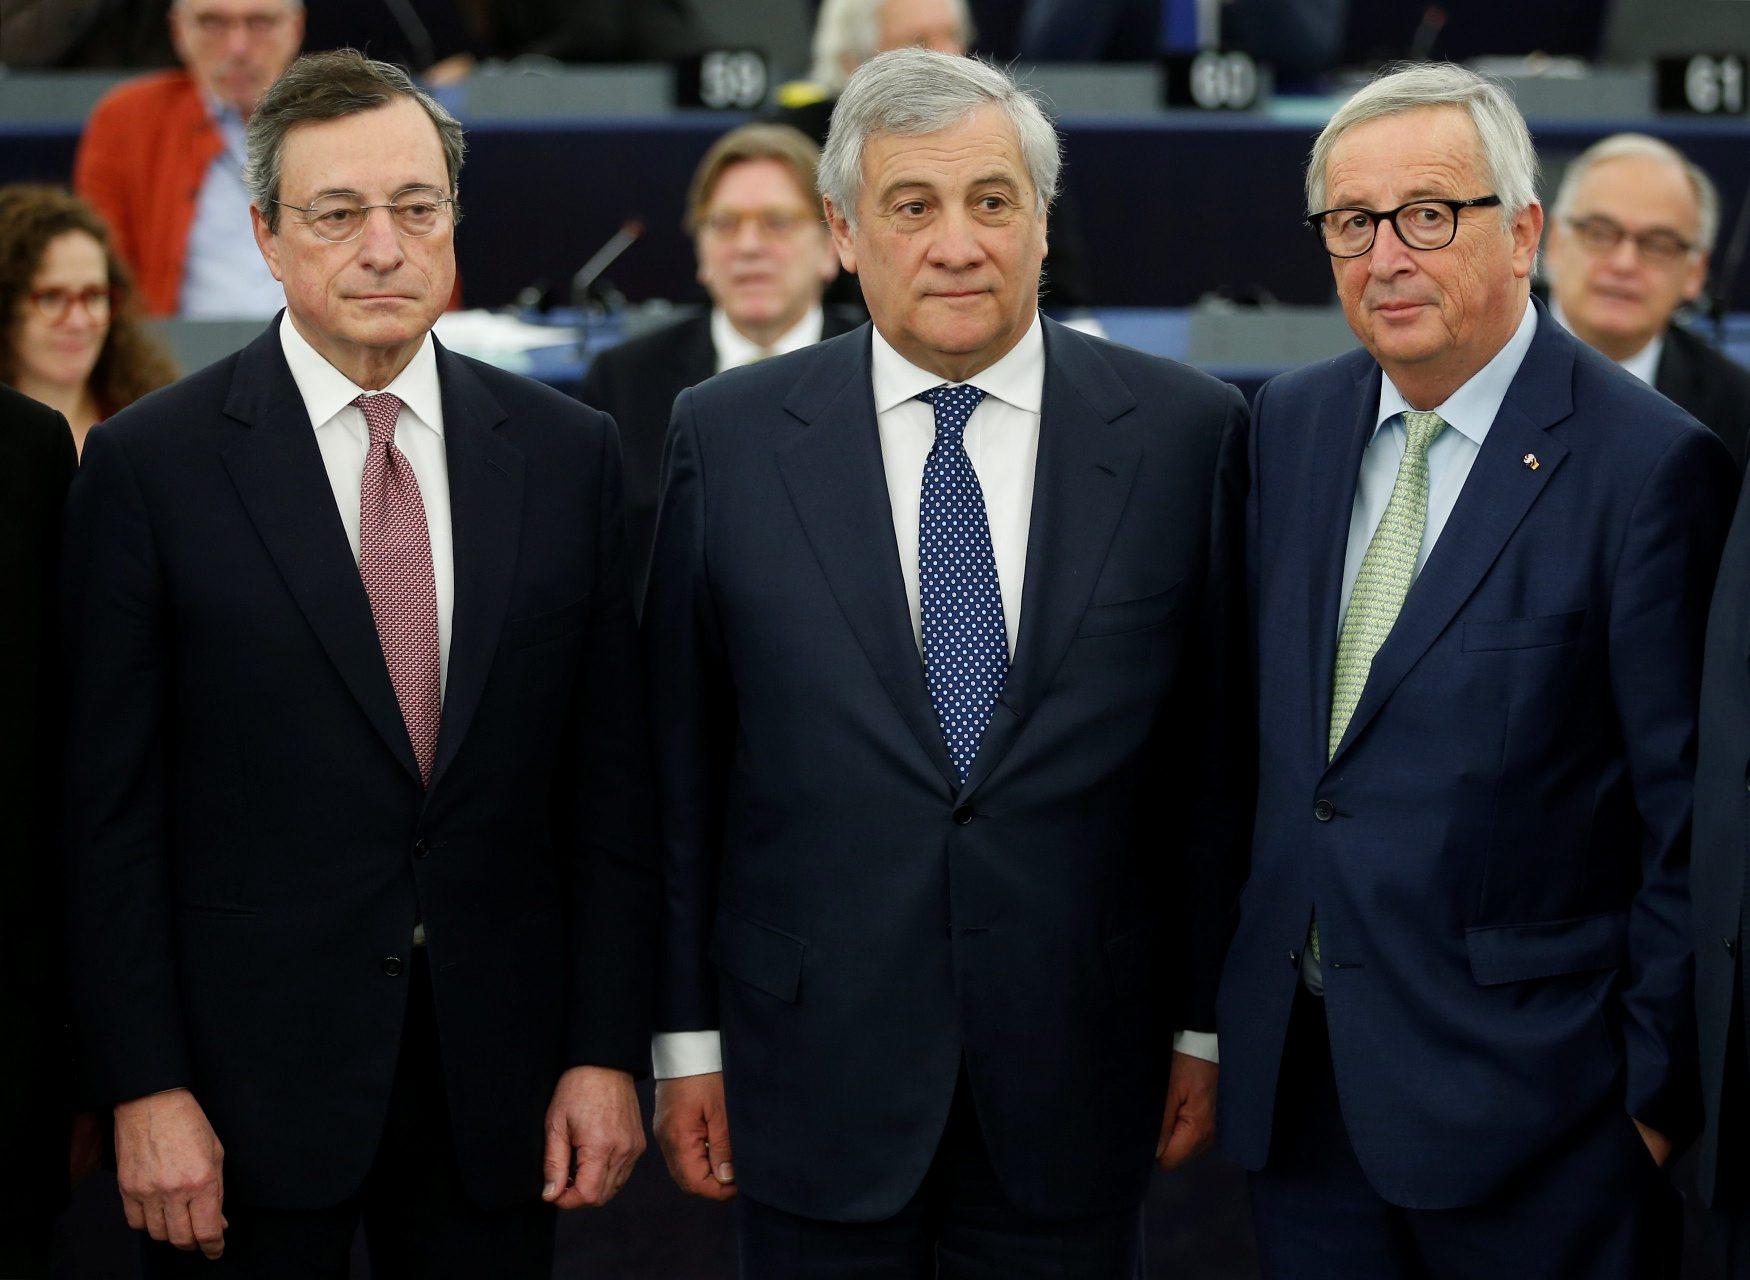 Predsjednik Europskog parlamenta Antonio Tajani (u sredini) s šefom Europske središnje banke Mariom Draghijem (lijevo) i predsjednikom Europske komisije Jean-Claude Junckerom